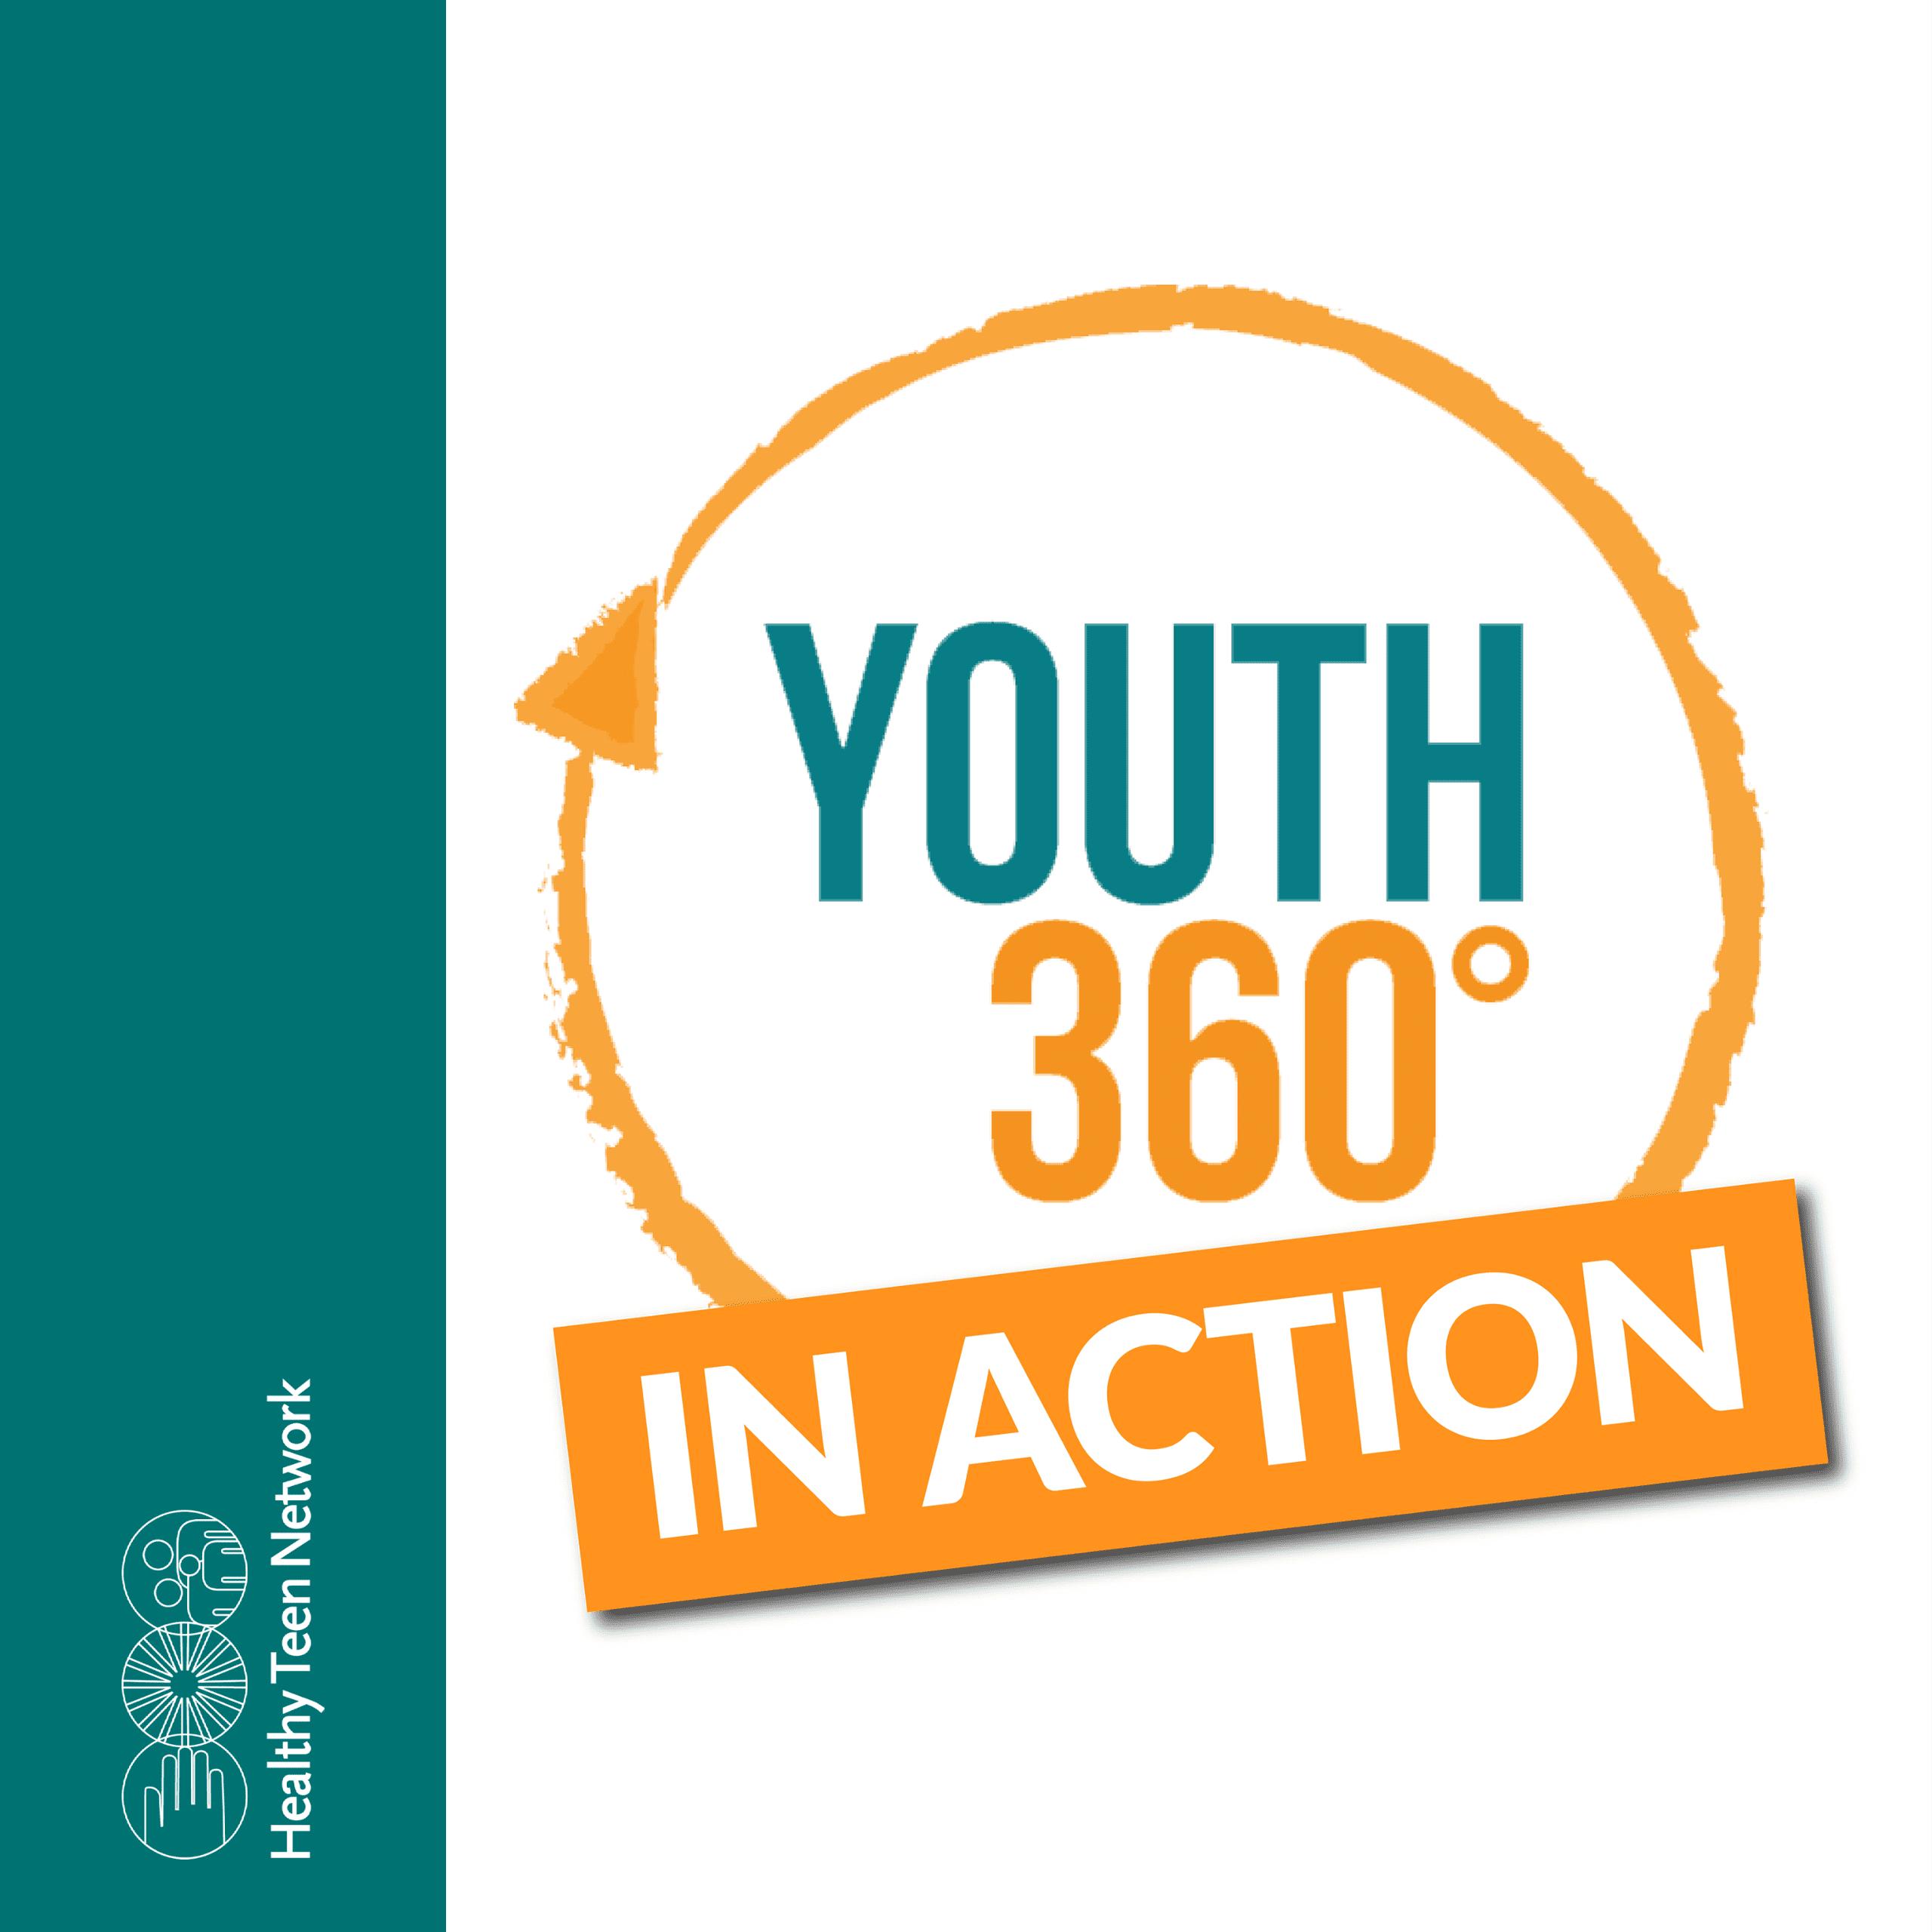 Cover slide for Youth 360 Prezi presentation